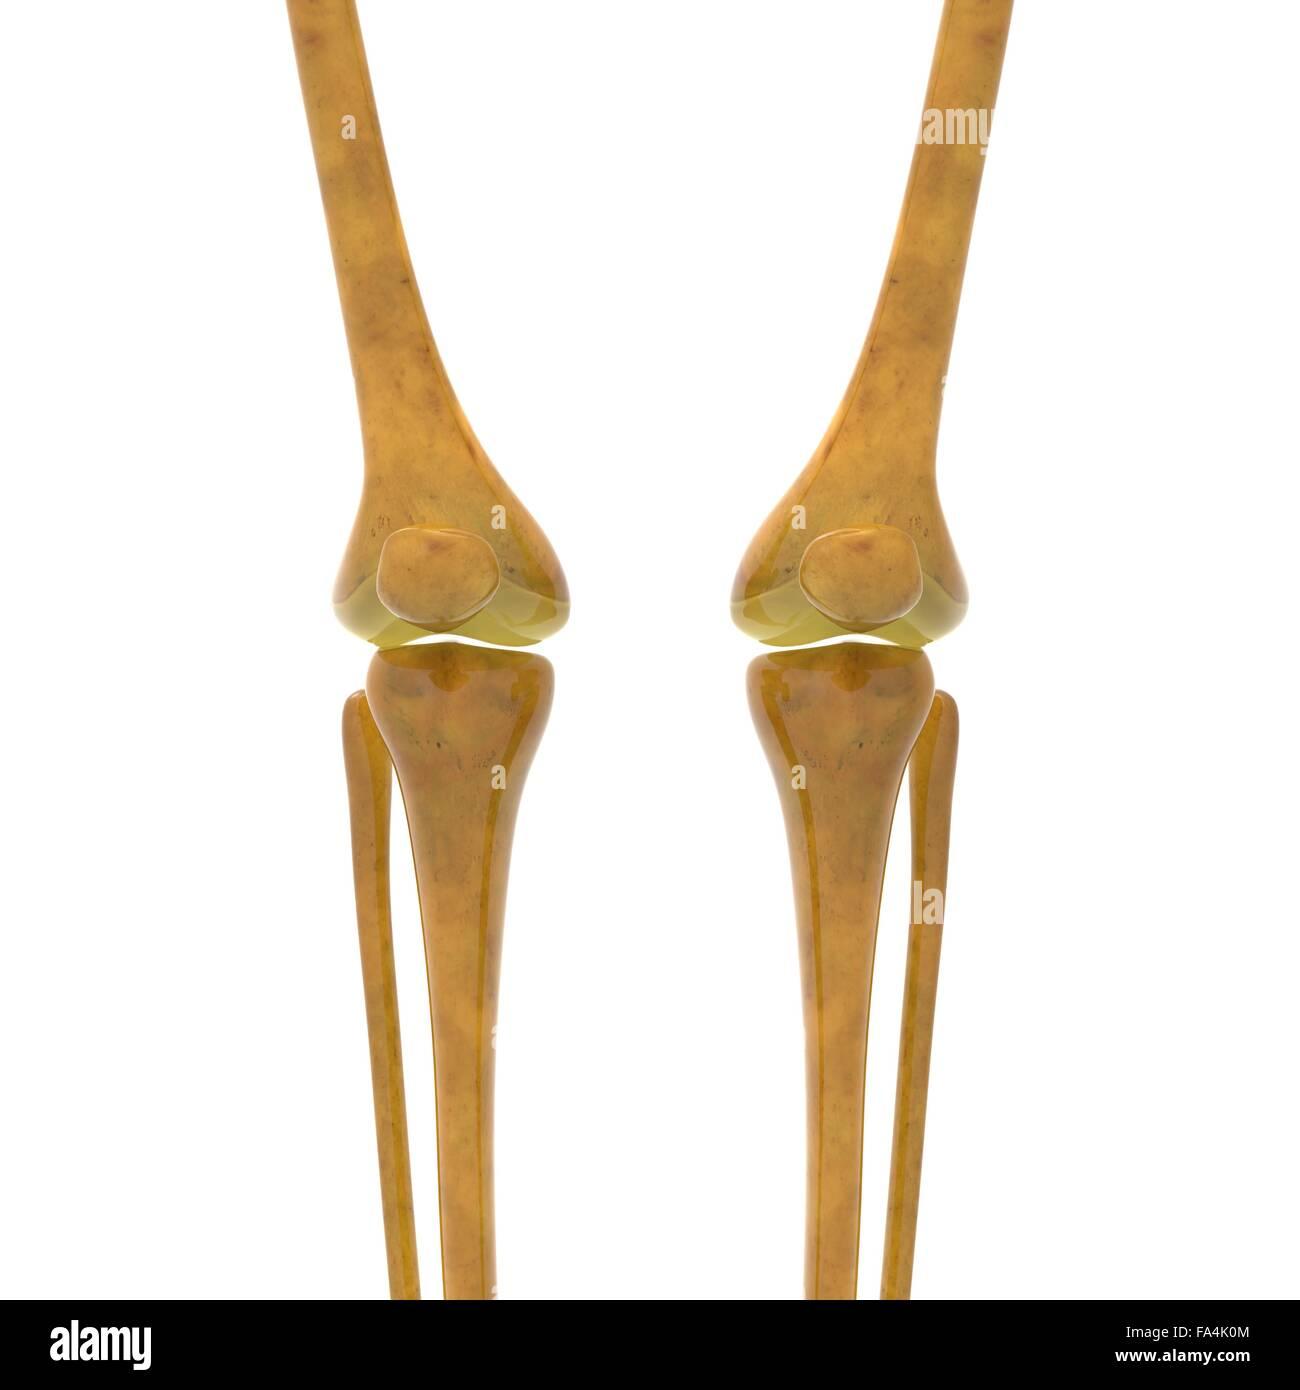 Medical Infographic Human Body Illustration Stockfotos & Medical ...